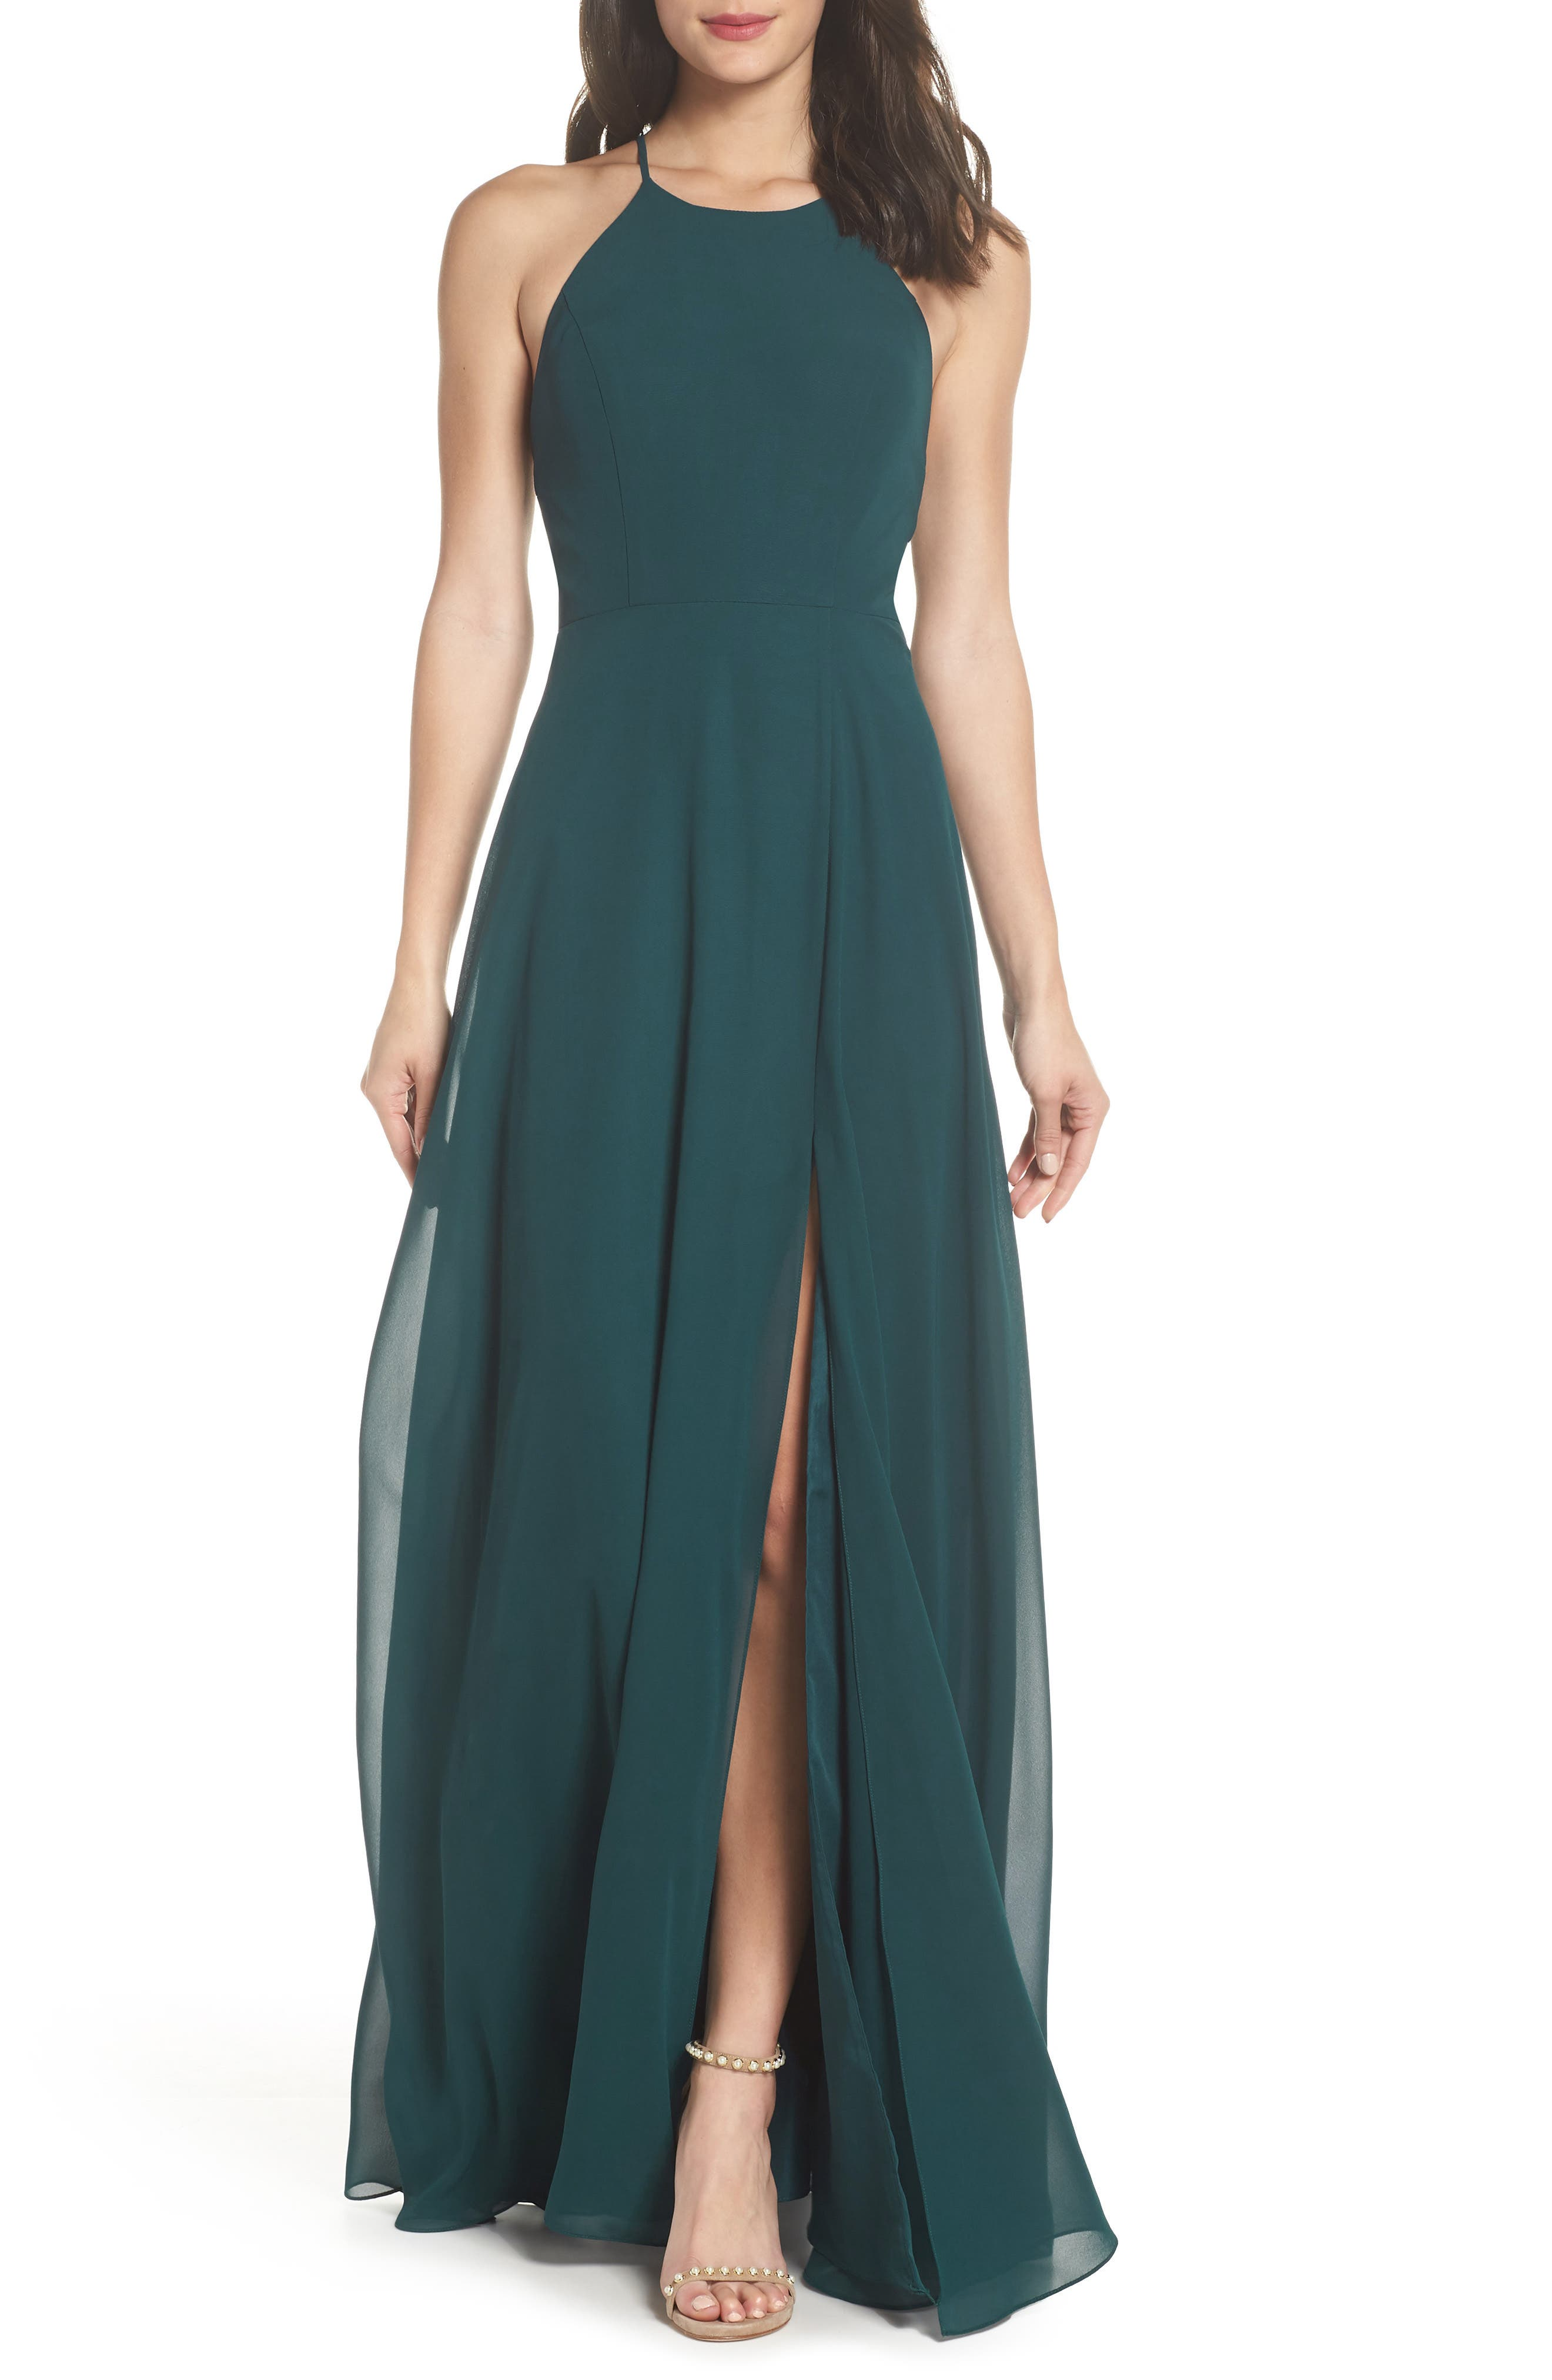 JENNY YOO, Kayla A-Line Halter Gown, Main thumbnail 1, color, CASPIAN SEA